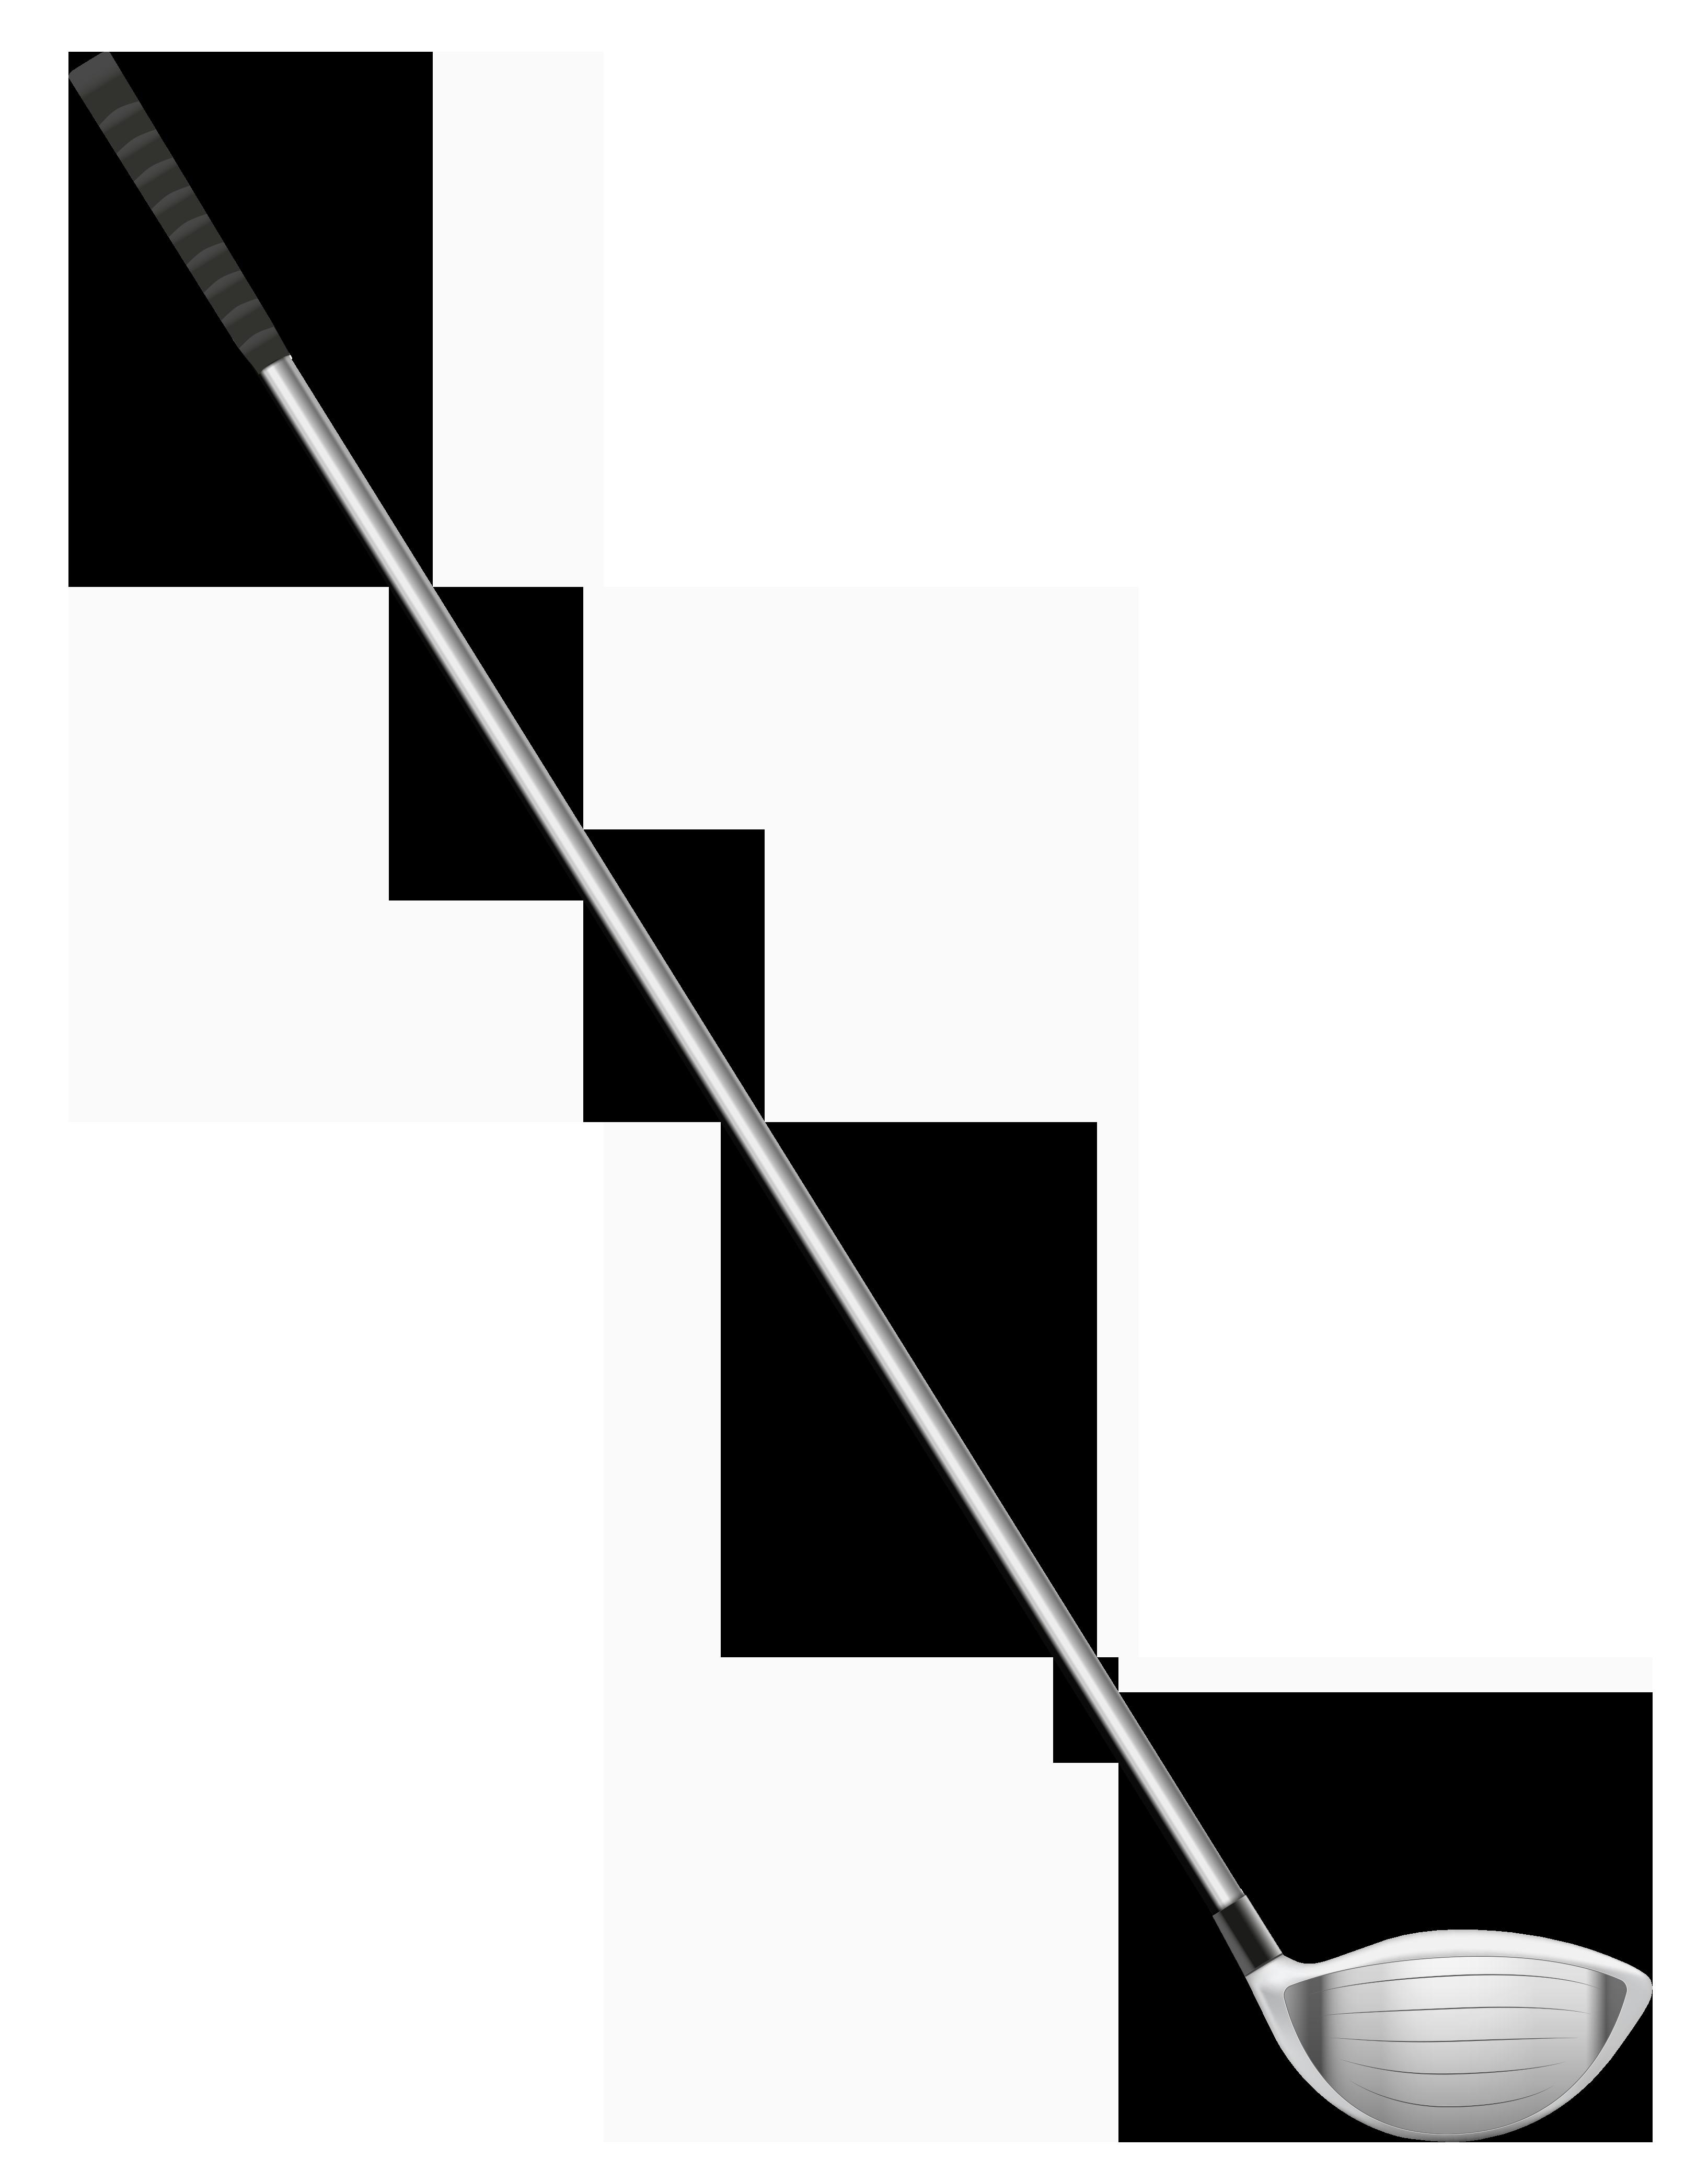 Club clipart golf stick Club stick picture famclipart art